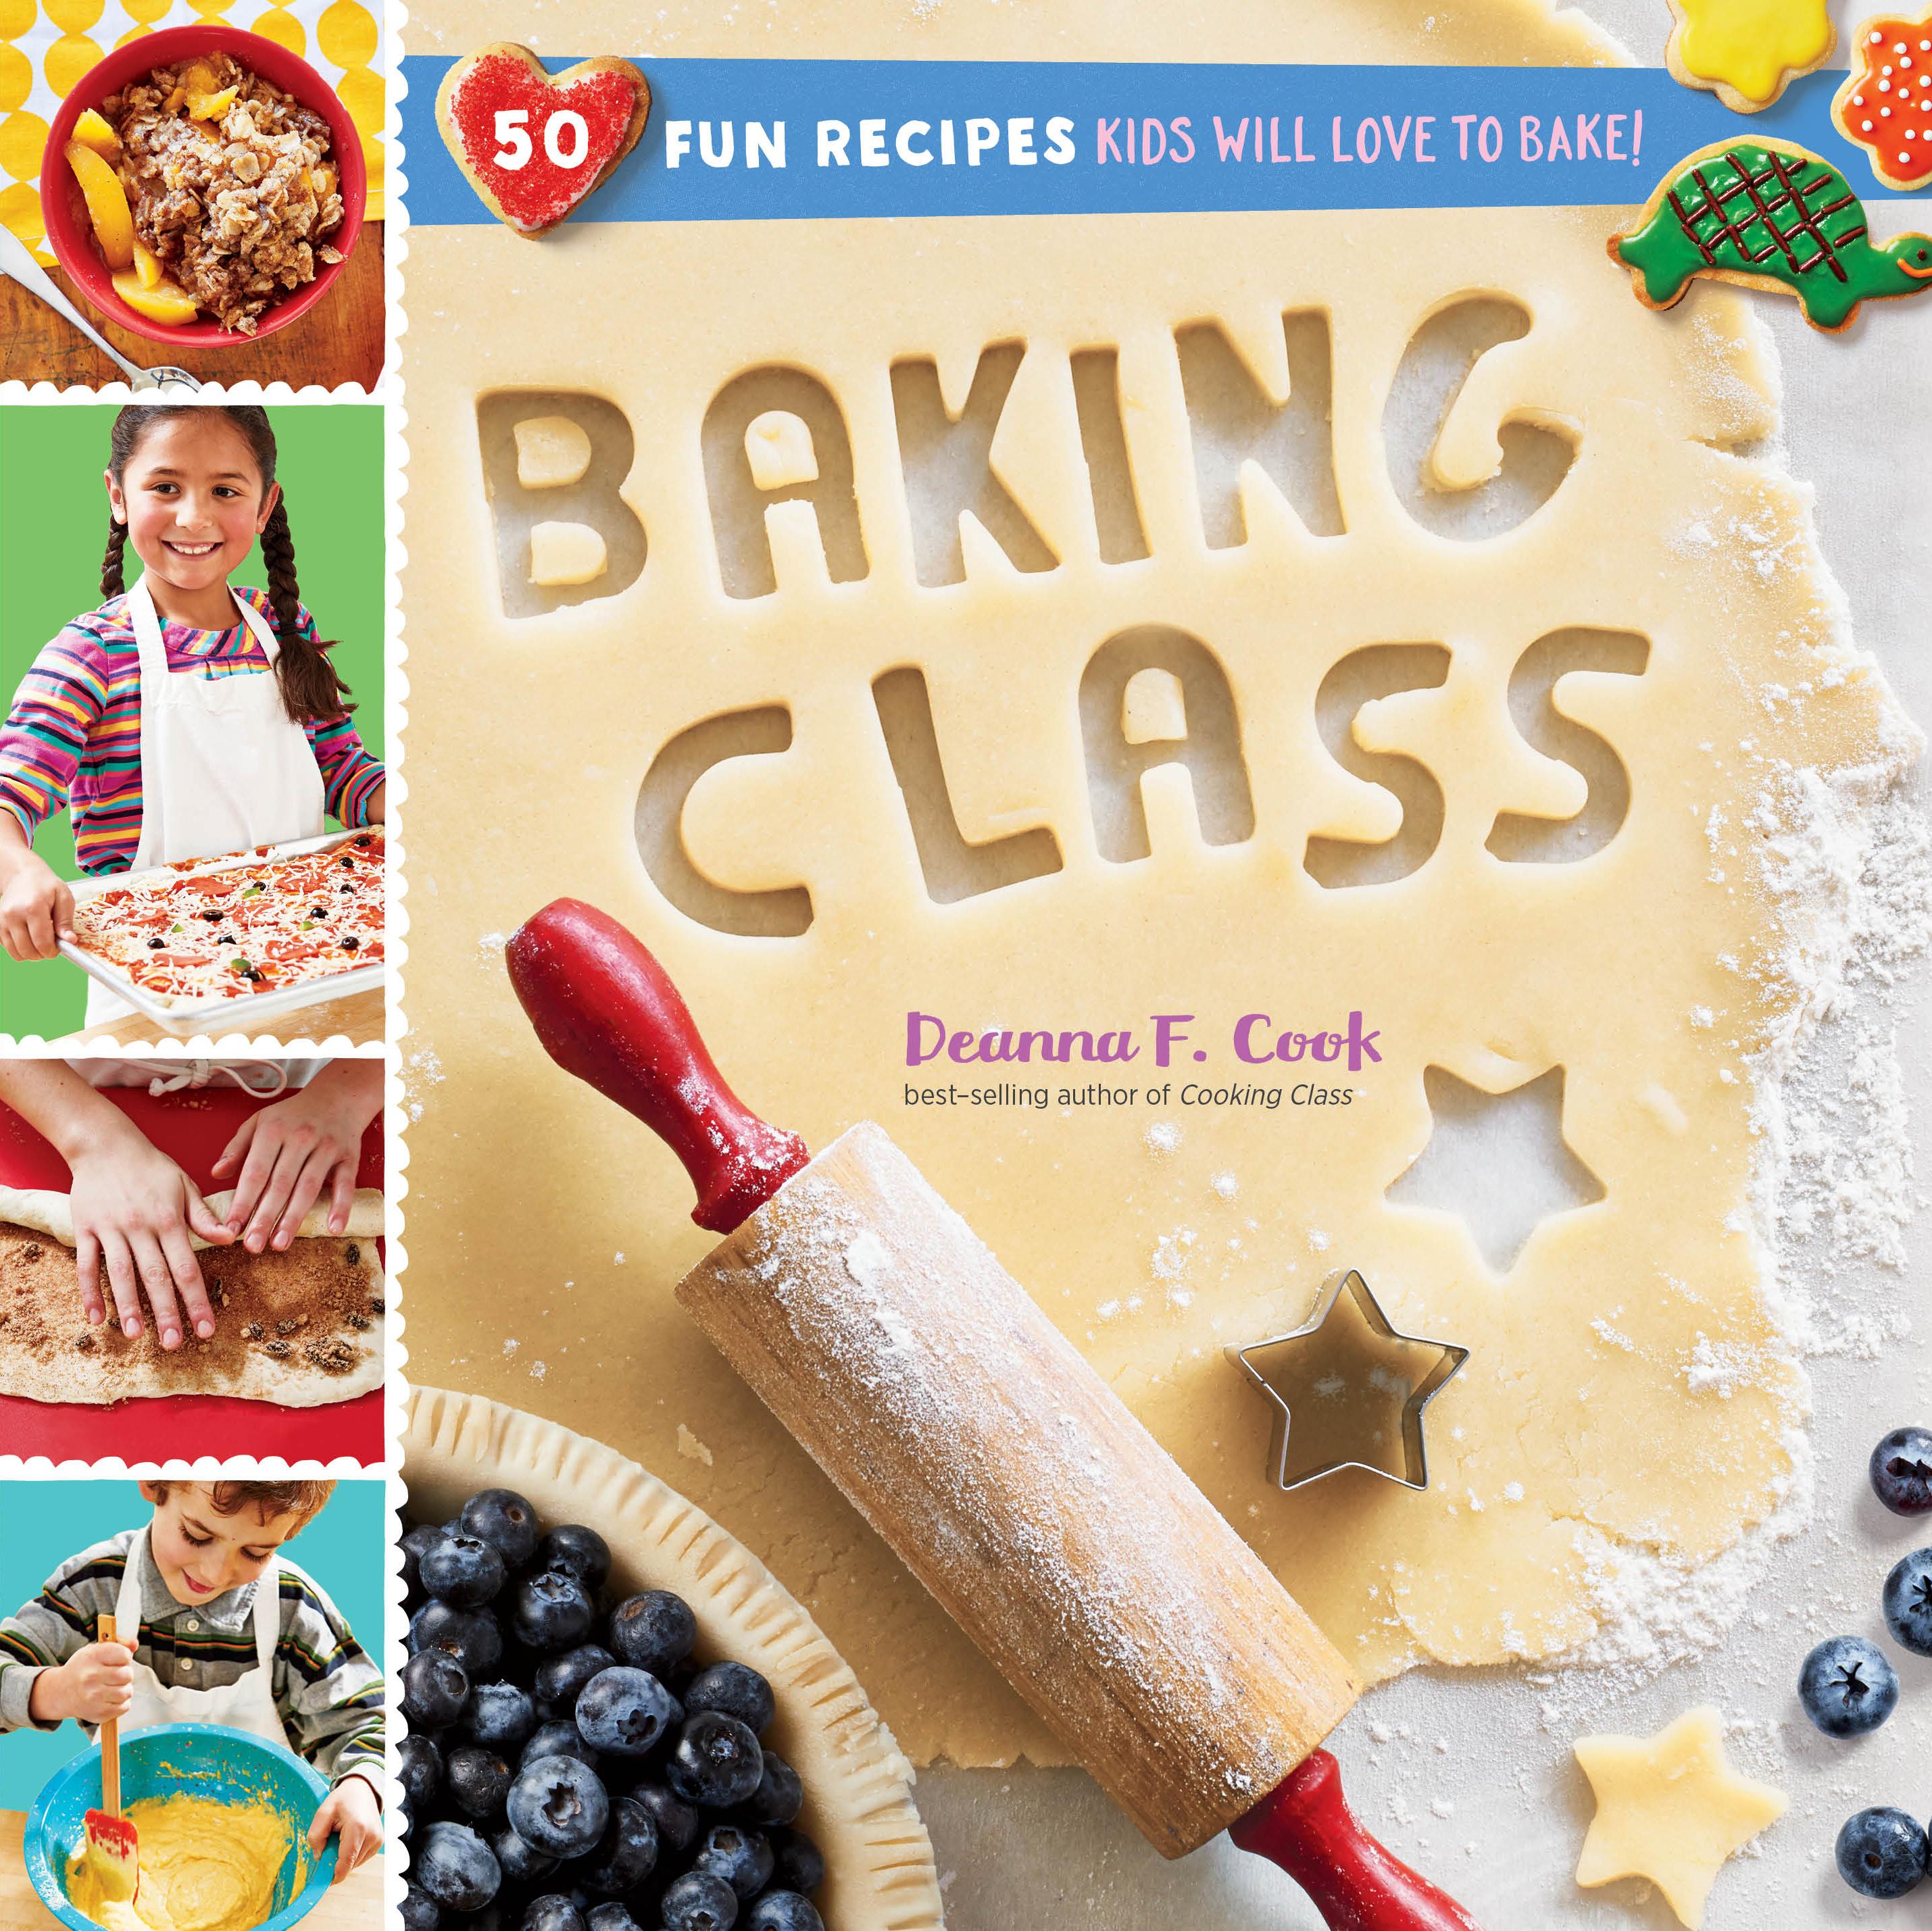 Baking Class 50 Fun Recipes Kids Will Love to Bake! - Deanna F. Cook